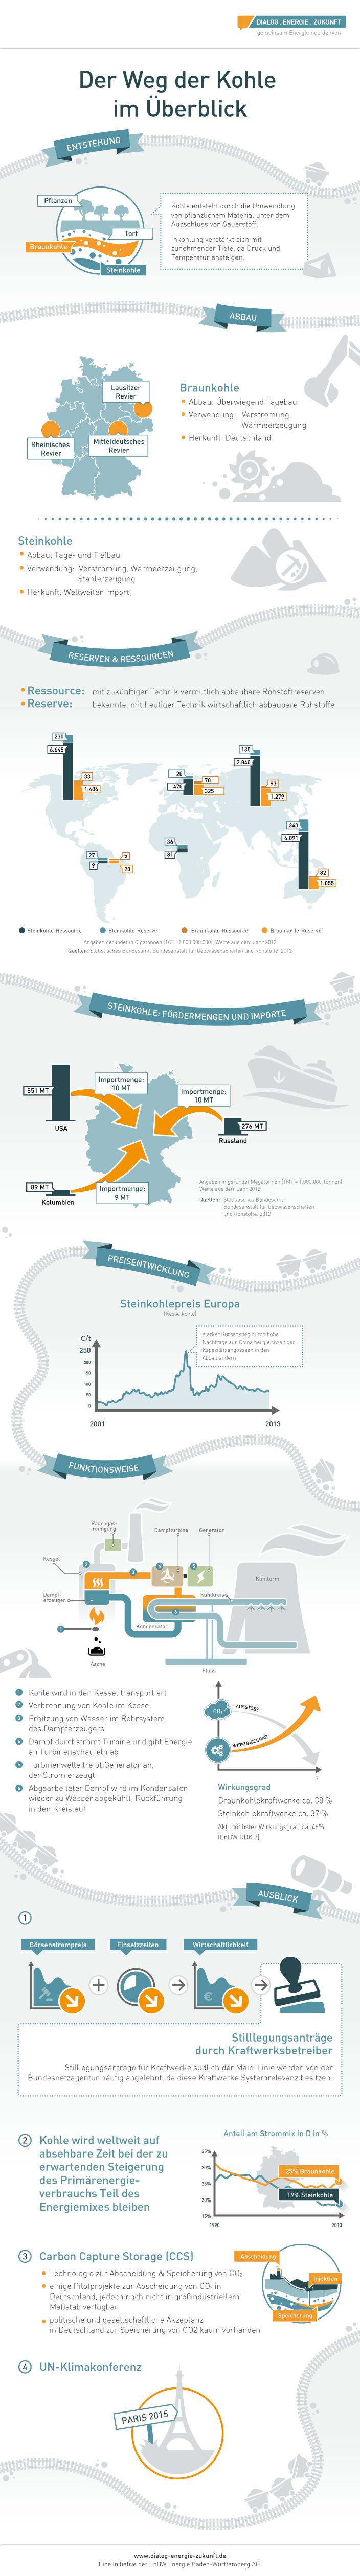 infografik_kohle_in_deutschland_20141016